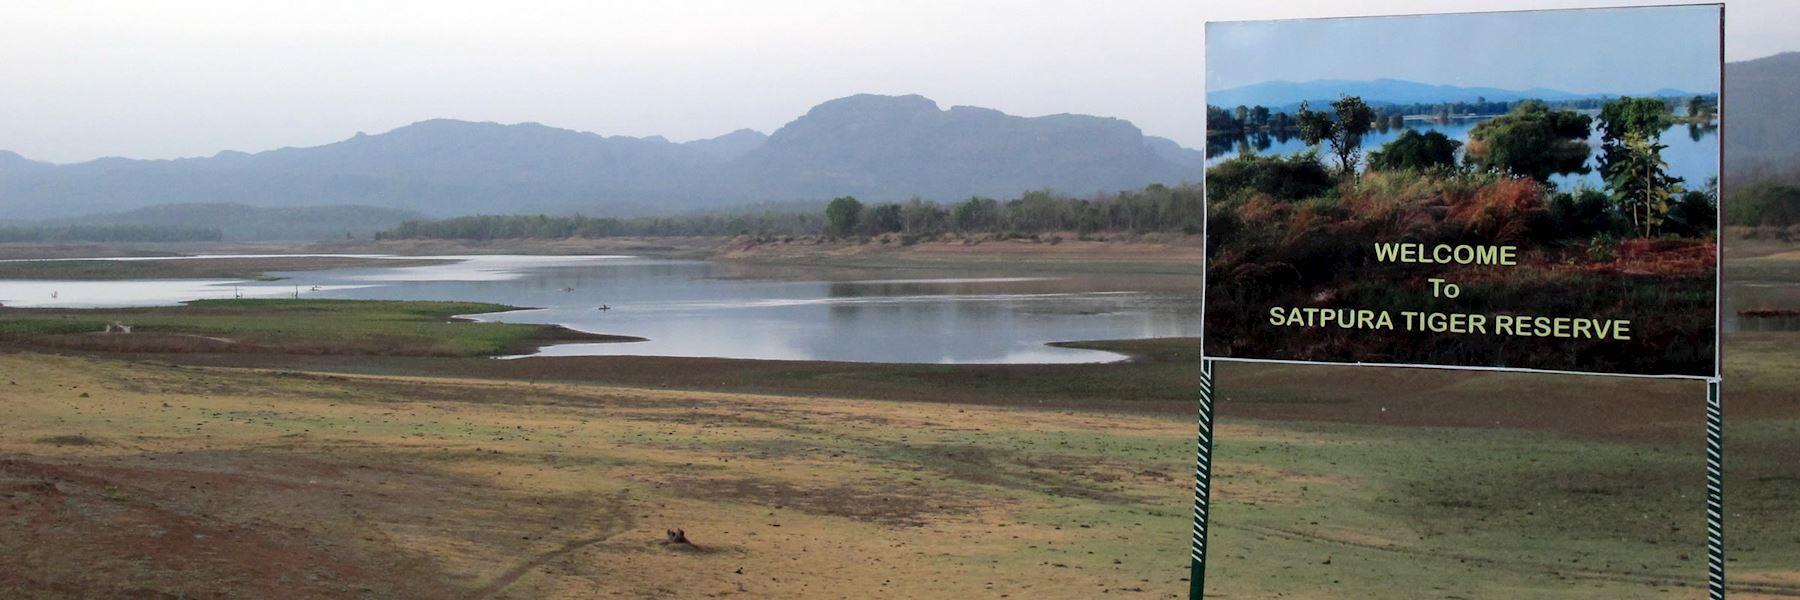 Visit Satpura National Park, India